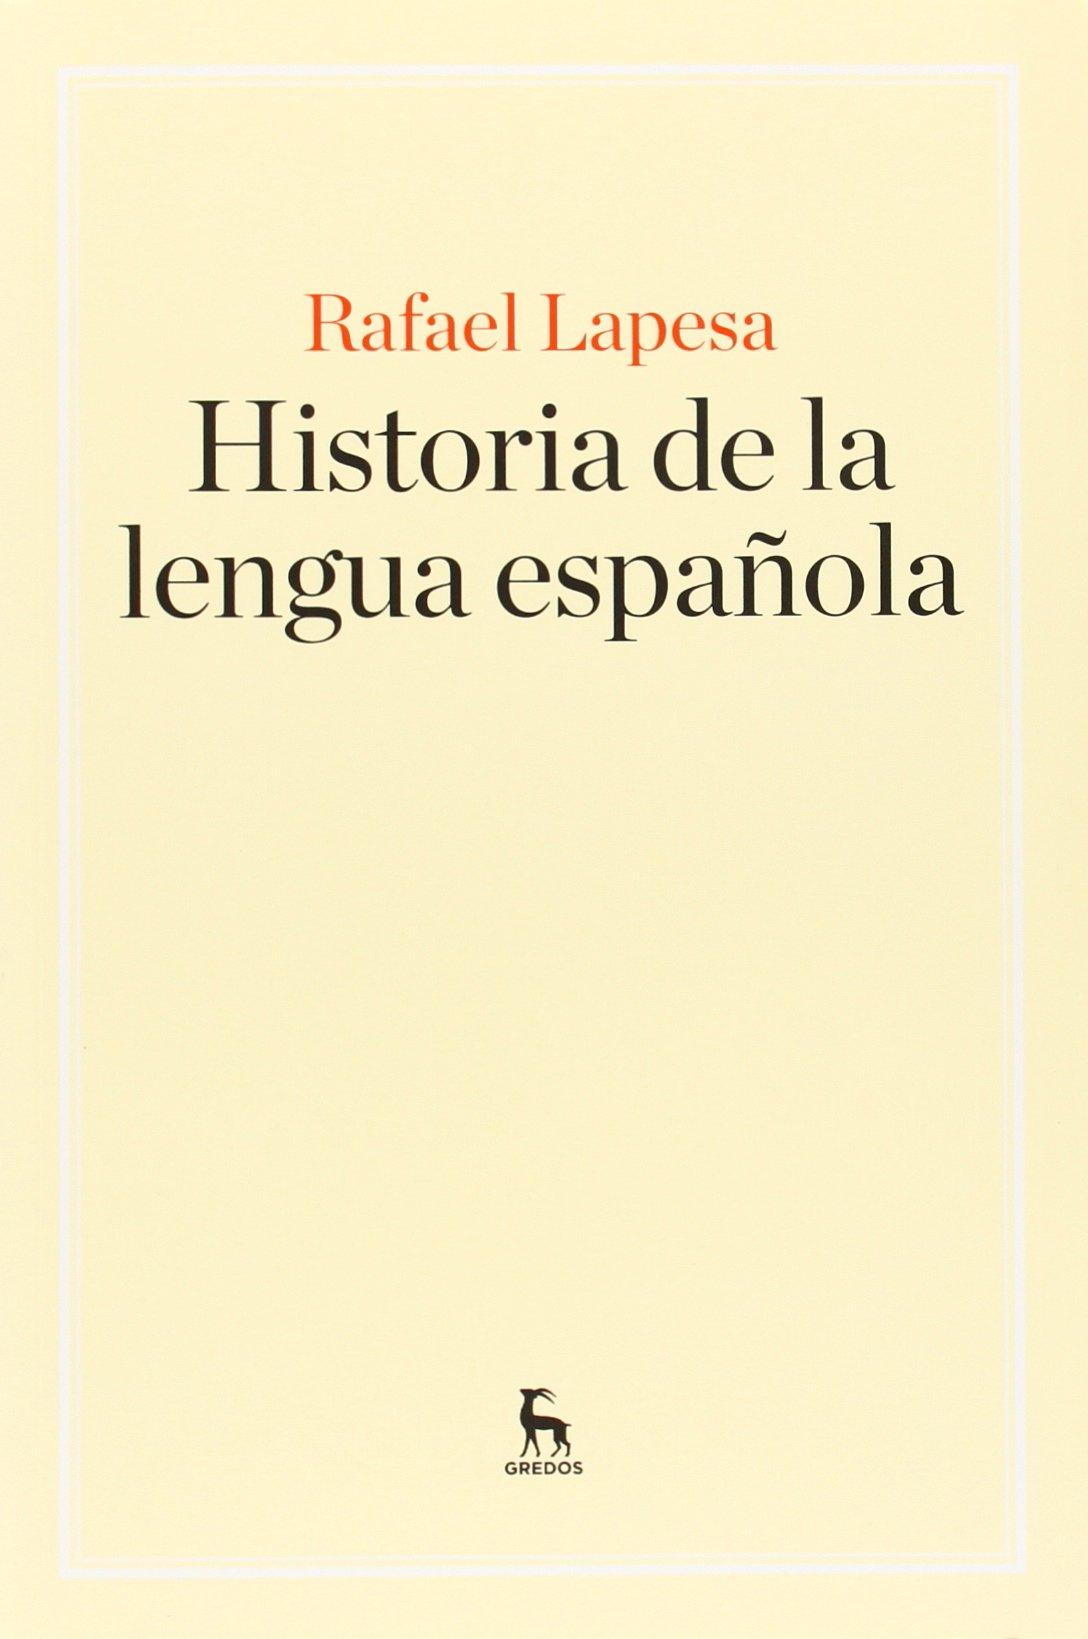 Historia de la lengua española (MANUALES): Amazon.es: Lapesa Melgar, Rafael: Libros